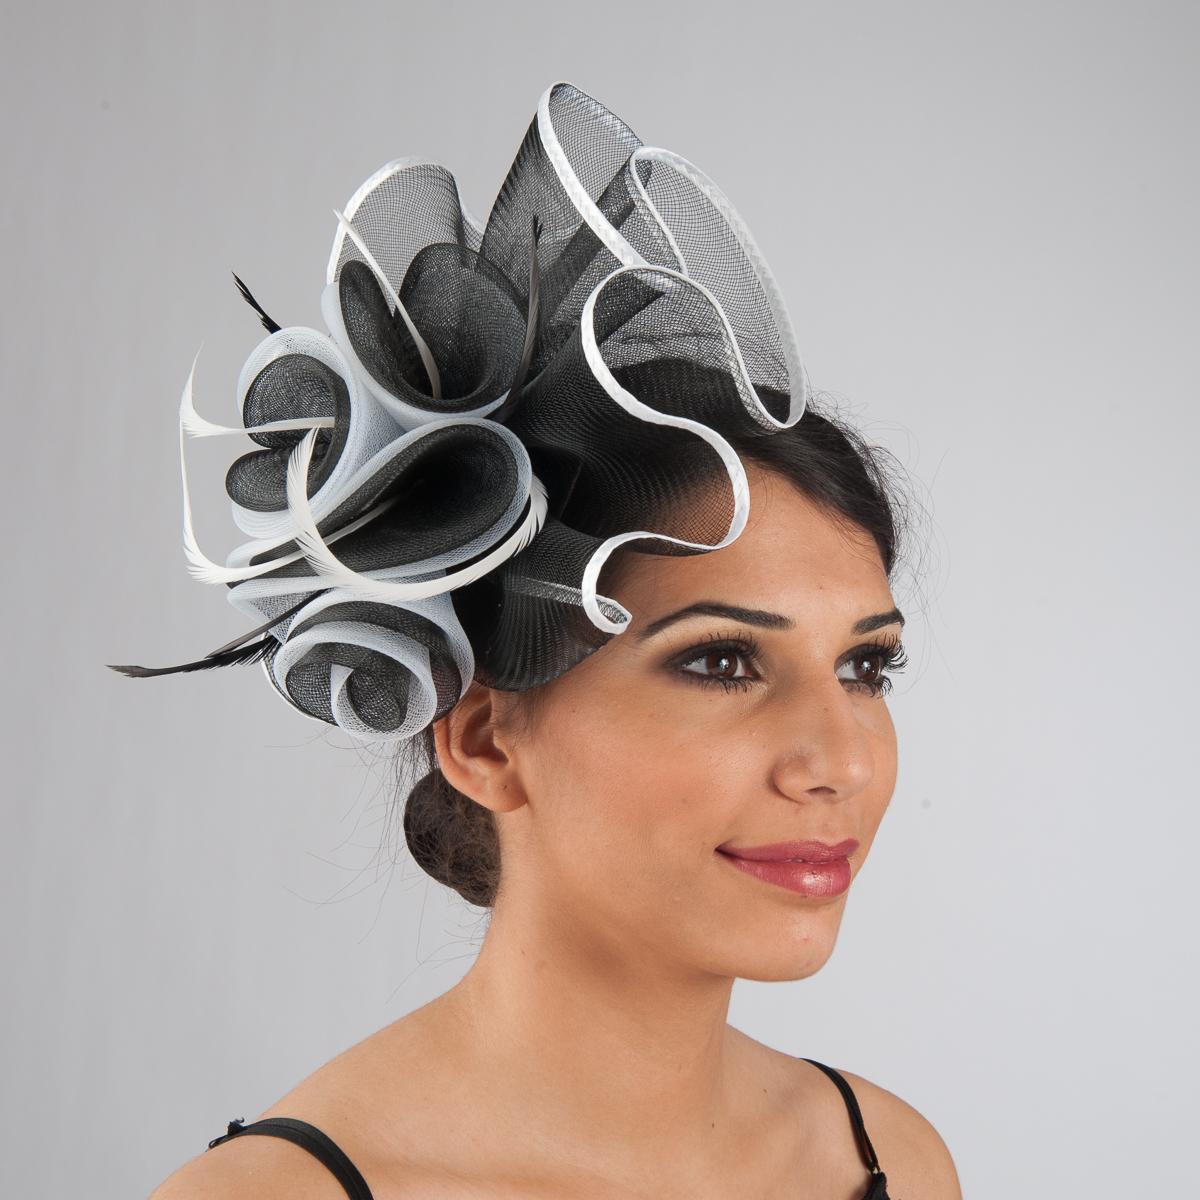 Black White Crinoline Comb Fascinator Cocktail Hats 5757c